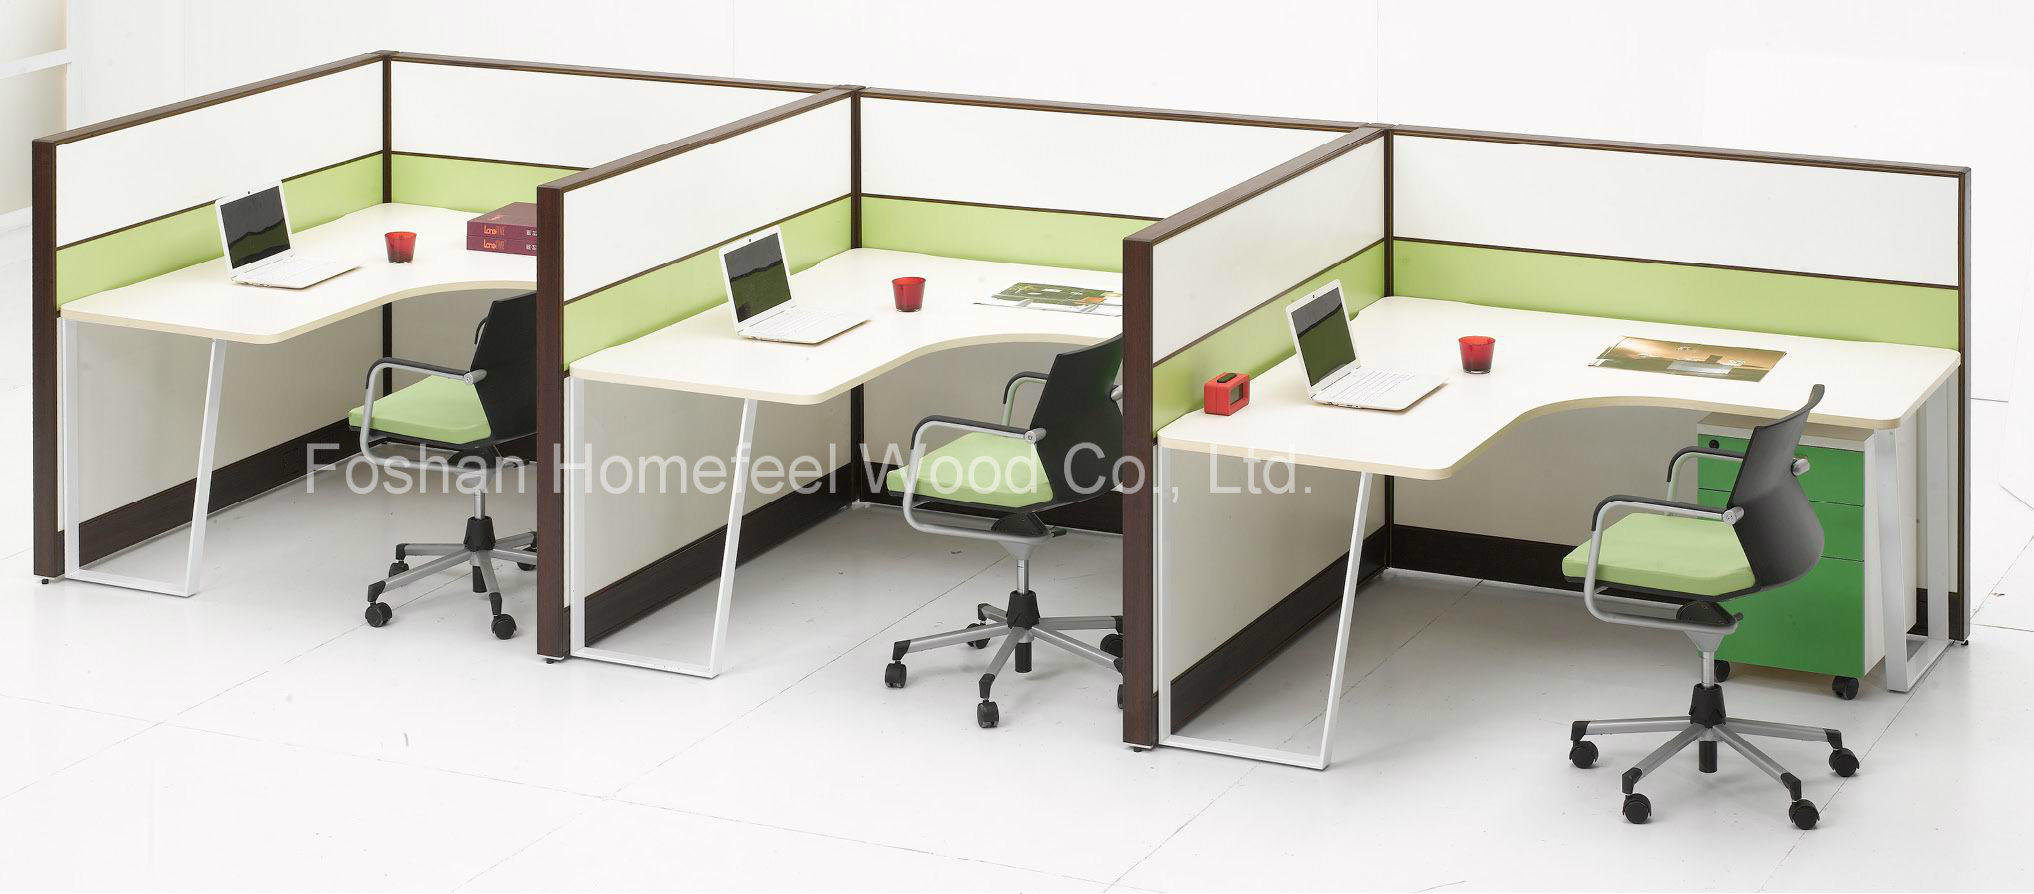 China Modern Modular Office Layout Computer Workstation